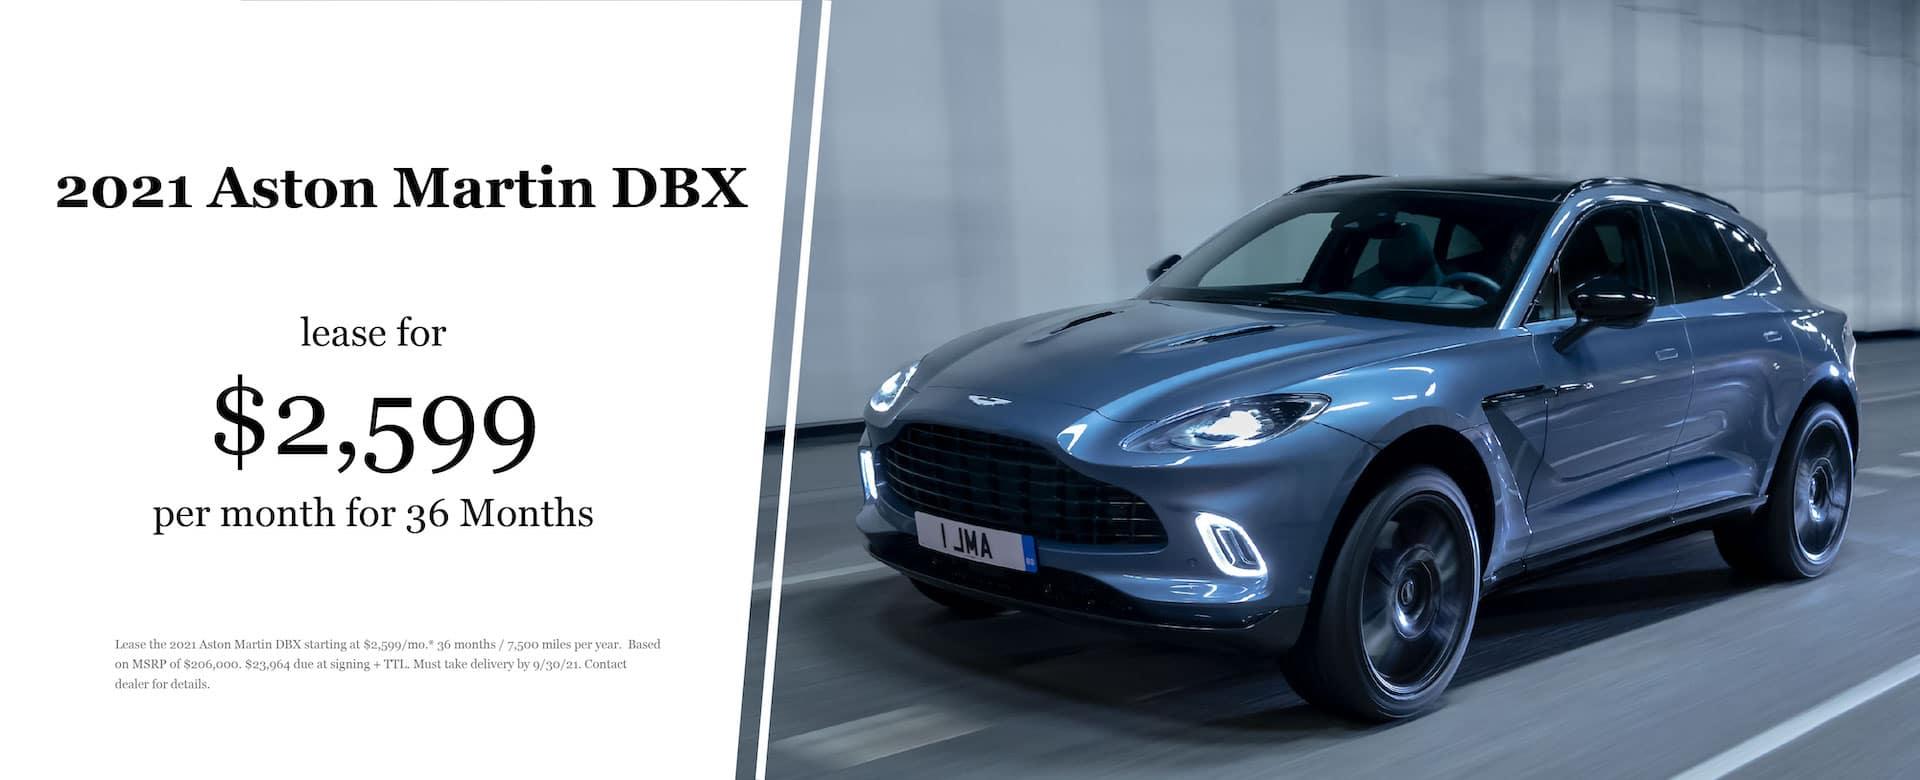 2021 Aston Martin DBX Lease Offer